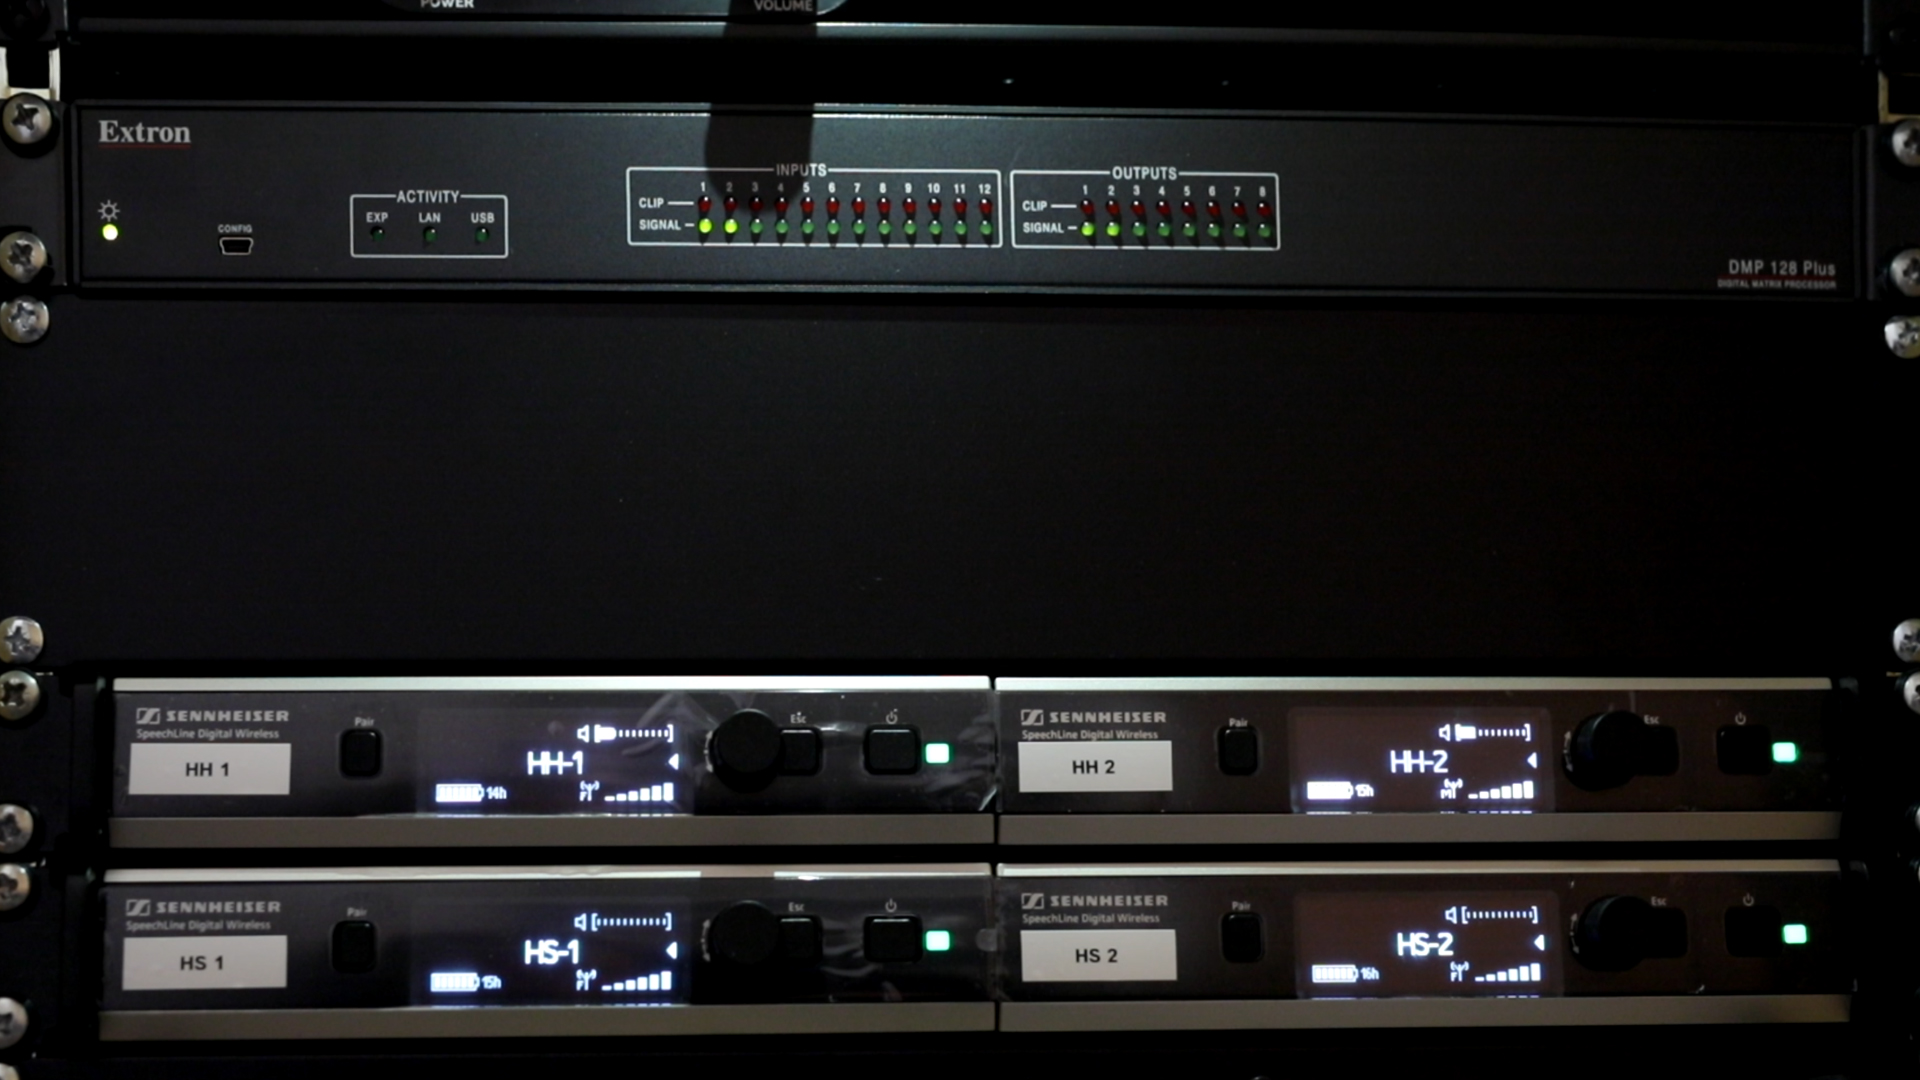 Soundssystem im Hörsaal in Max-Planck Institut für Biogeochemie in Jena